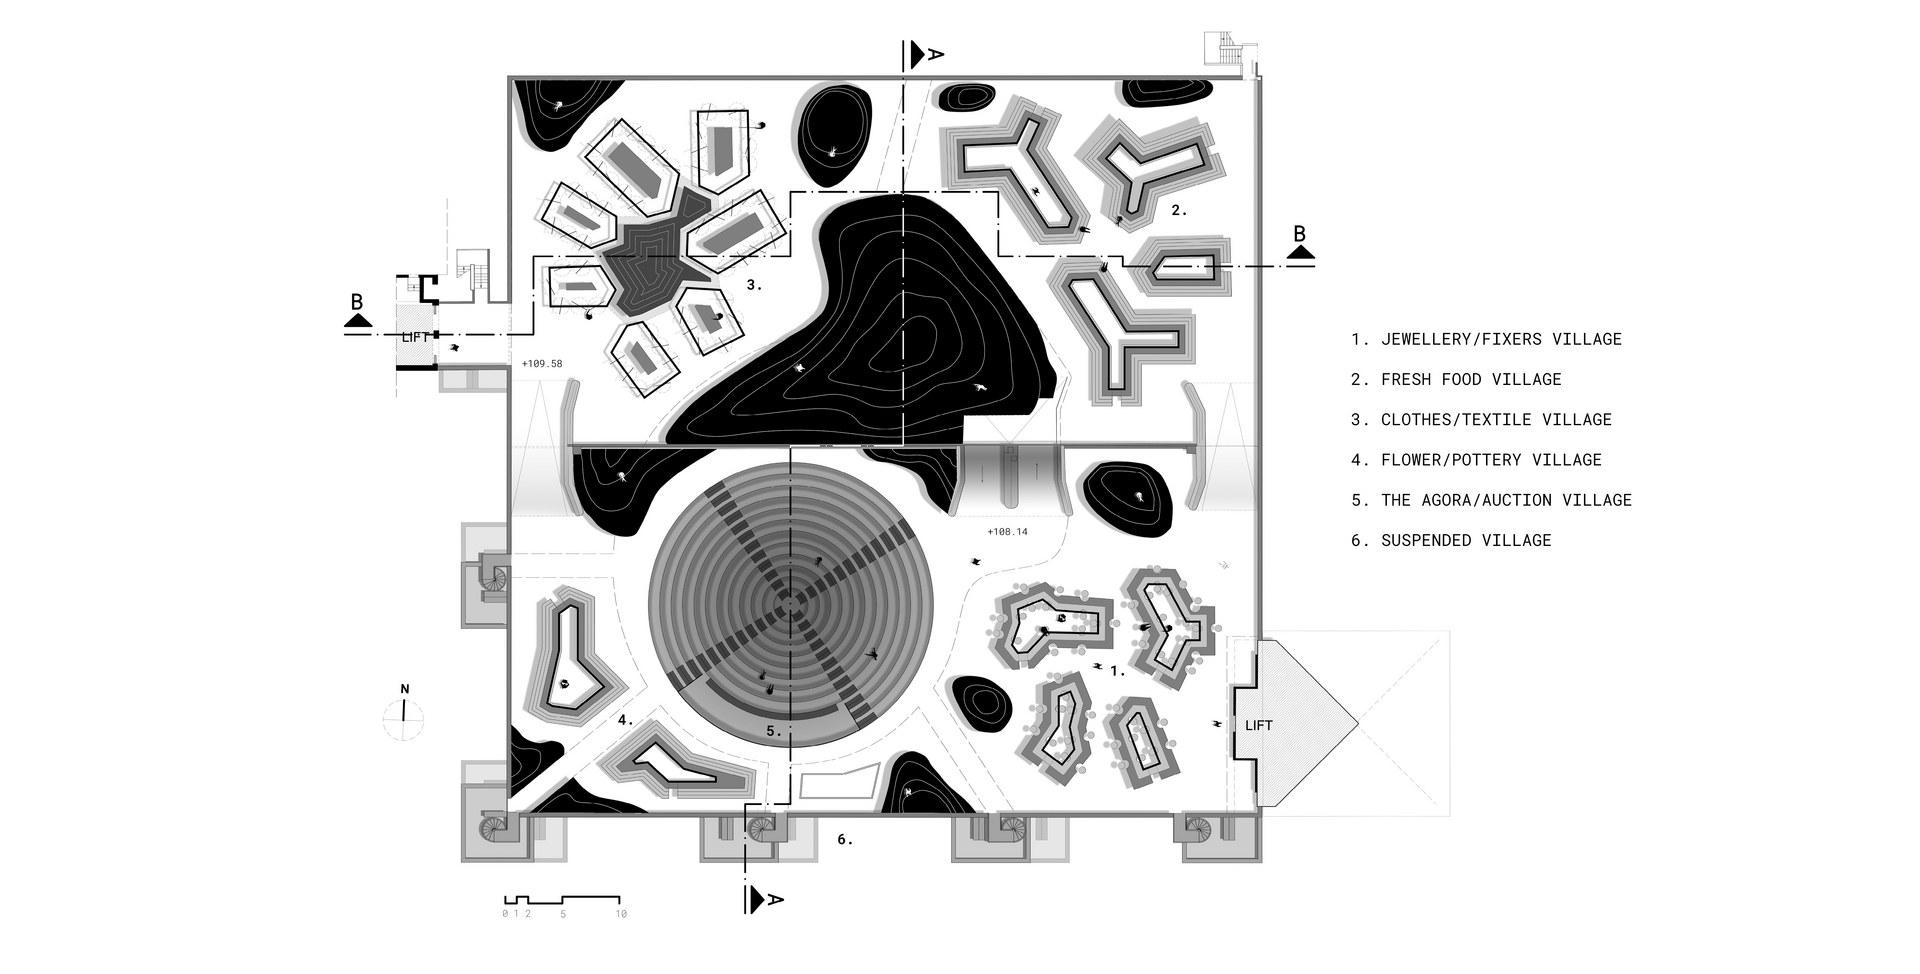 Floor Plan Lev. 5-6A_Scale 1:100